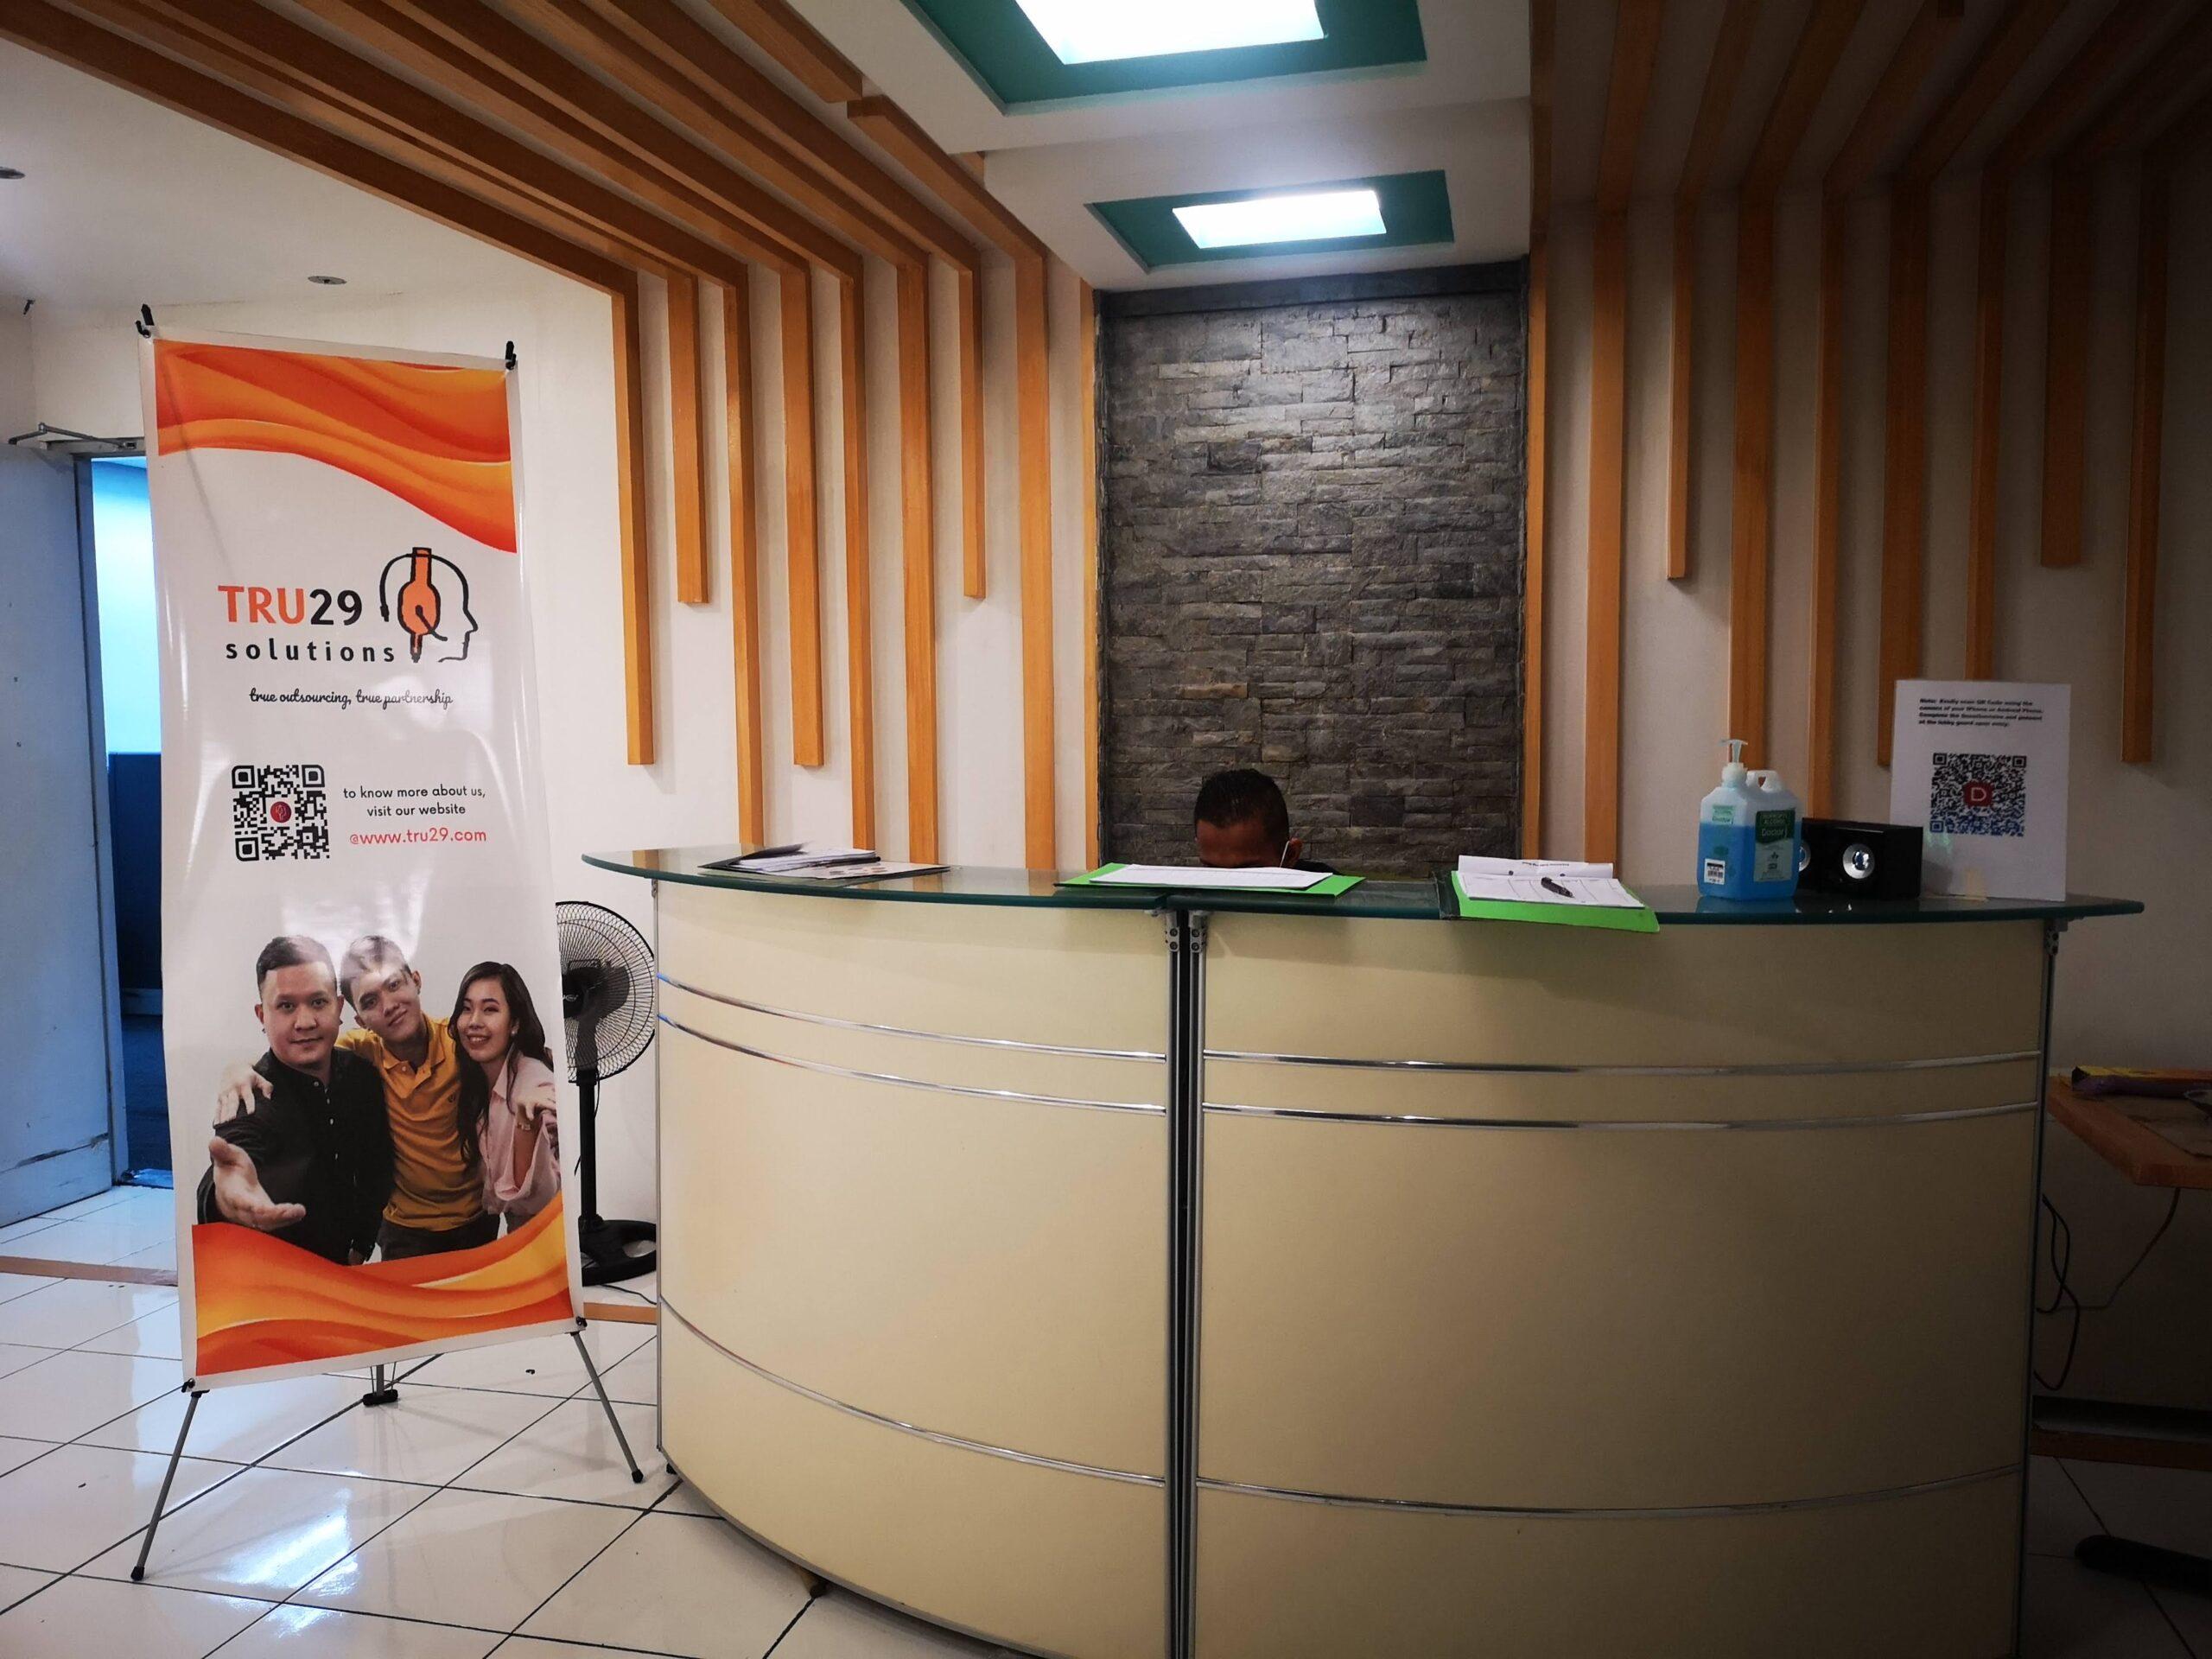 Tru29_reception_callCenter_BPO_staff_lease_remote_worker_virtual_staff_Philippines_BPO_outsouring_manpower